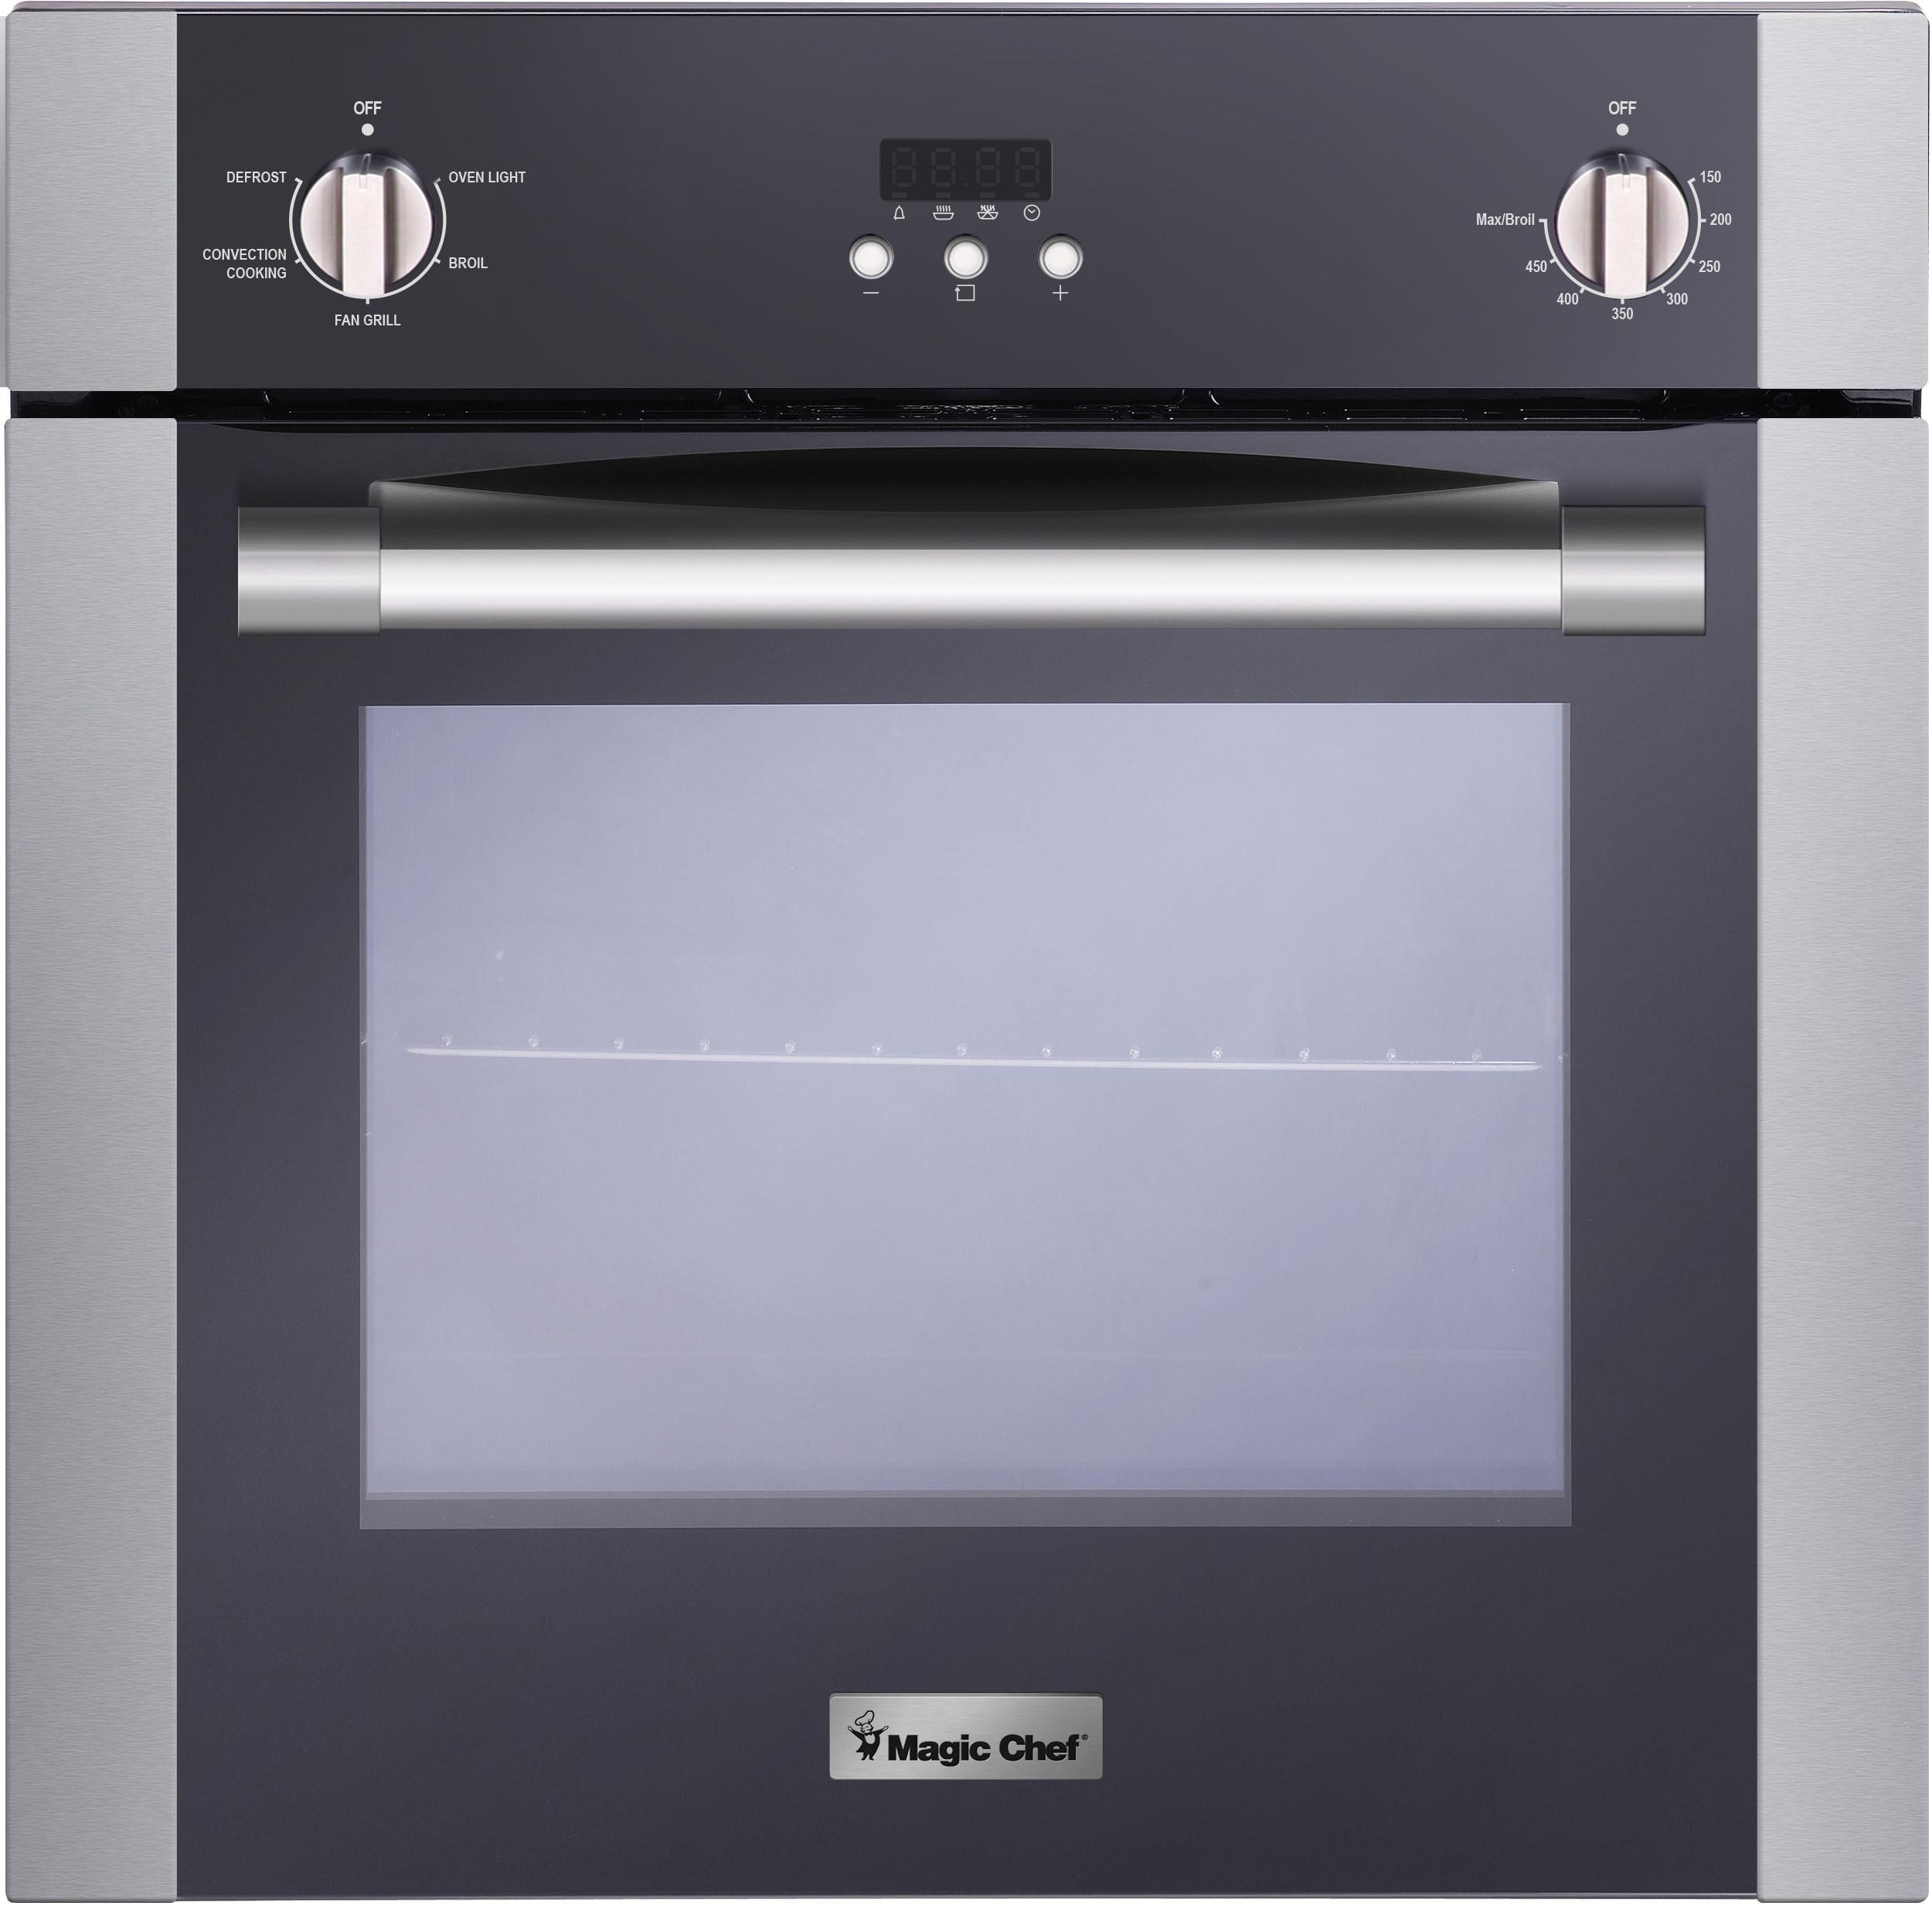 white dishwasher mini place hands chef setting magic free midea countertops countertop